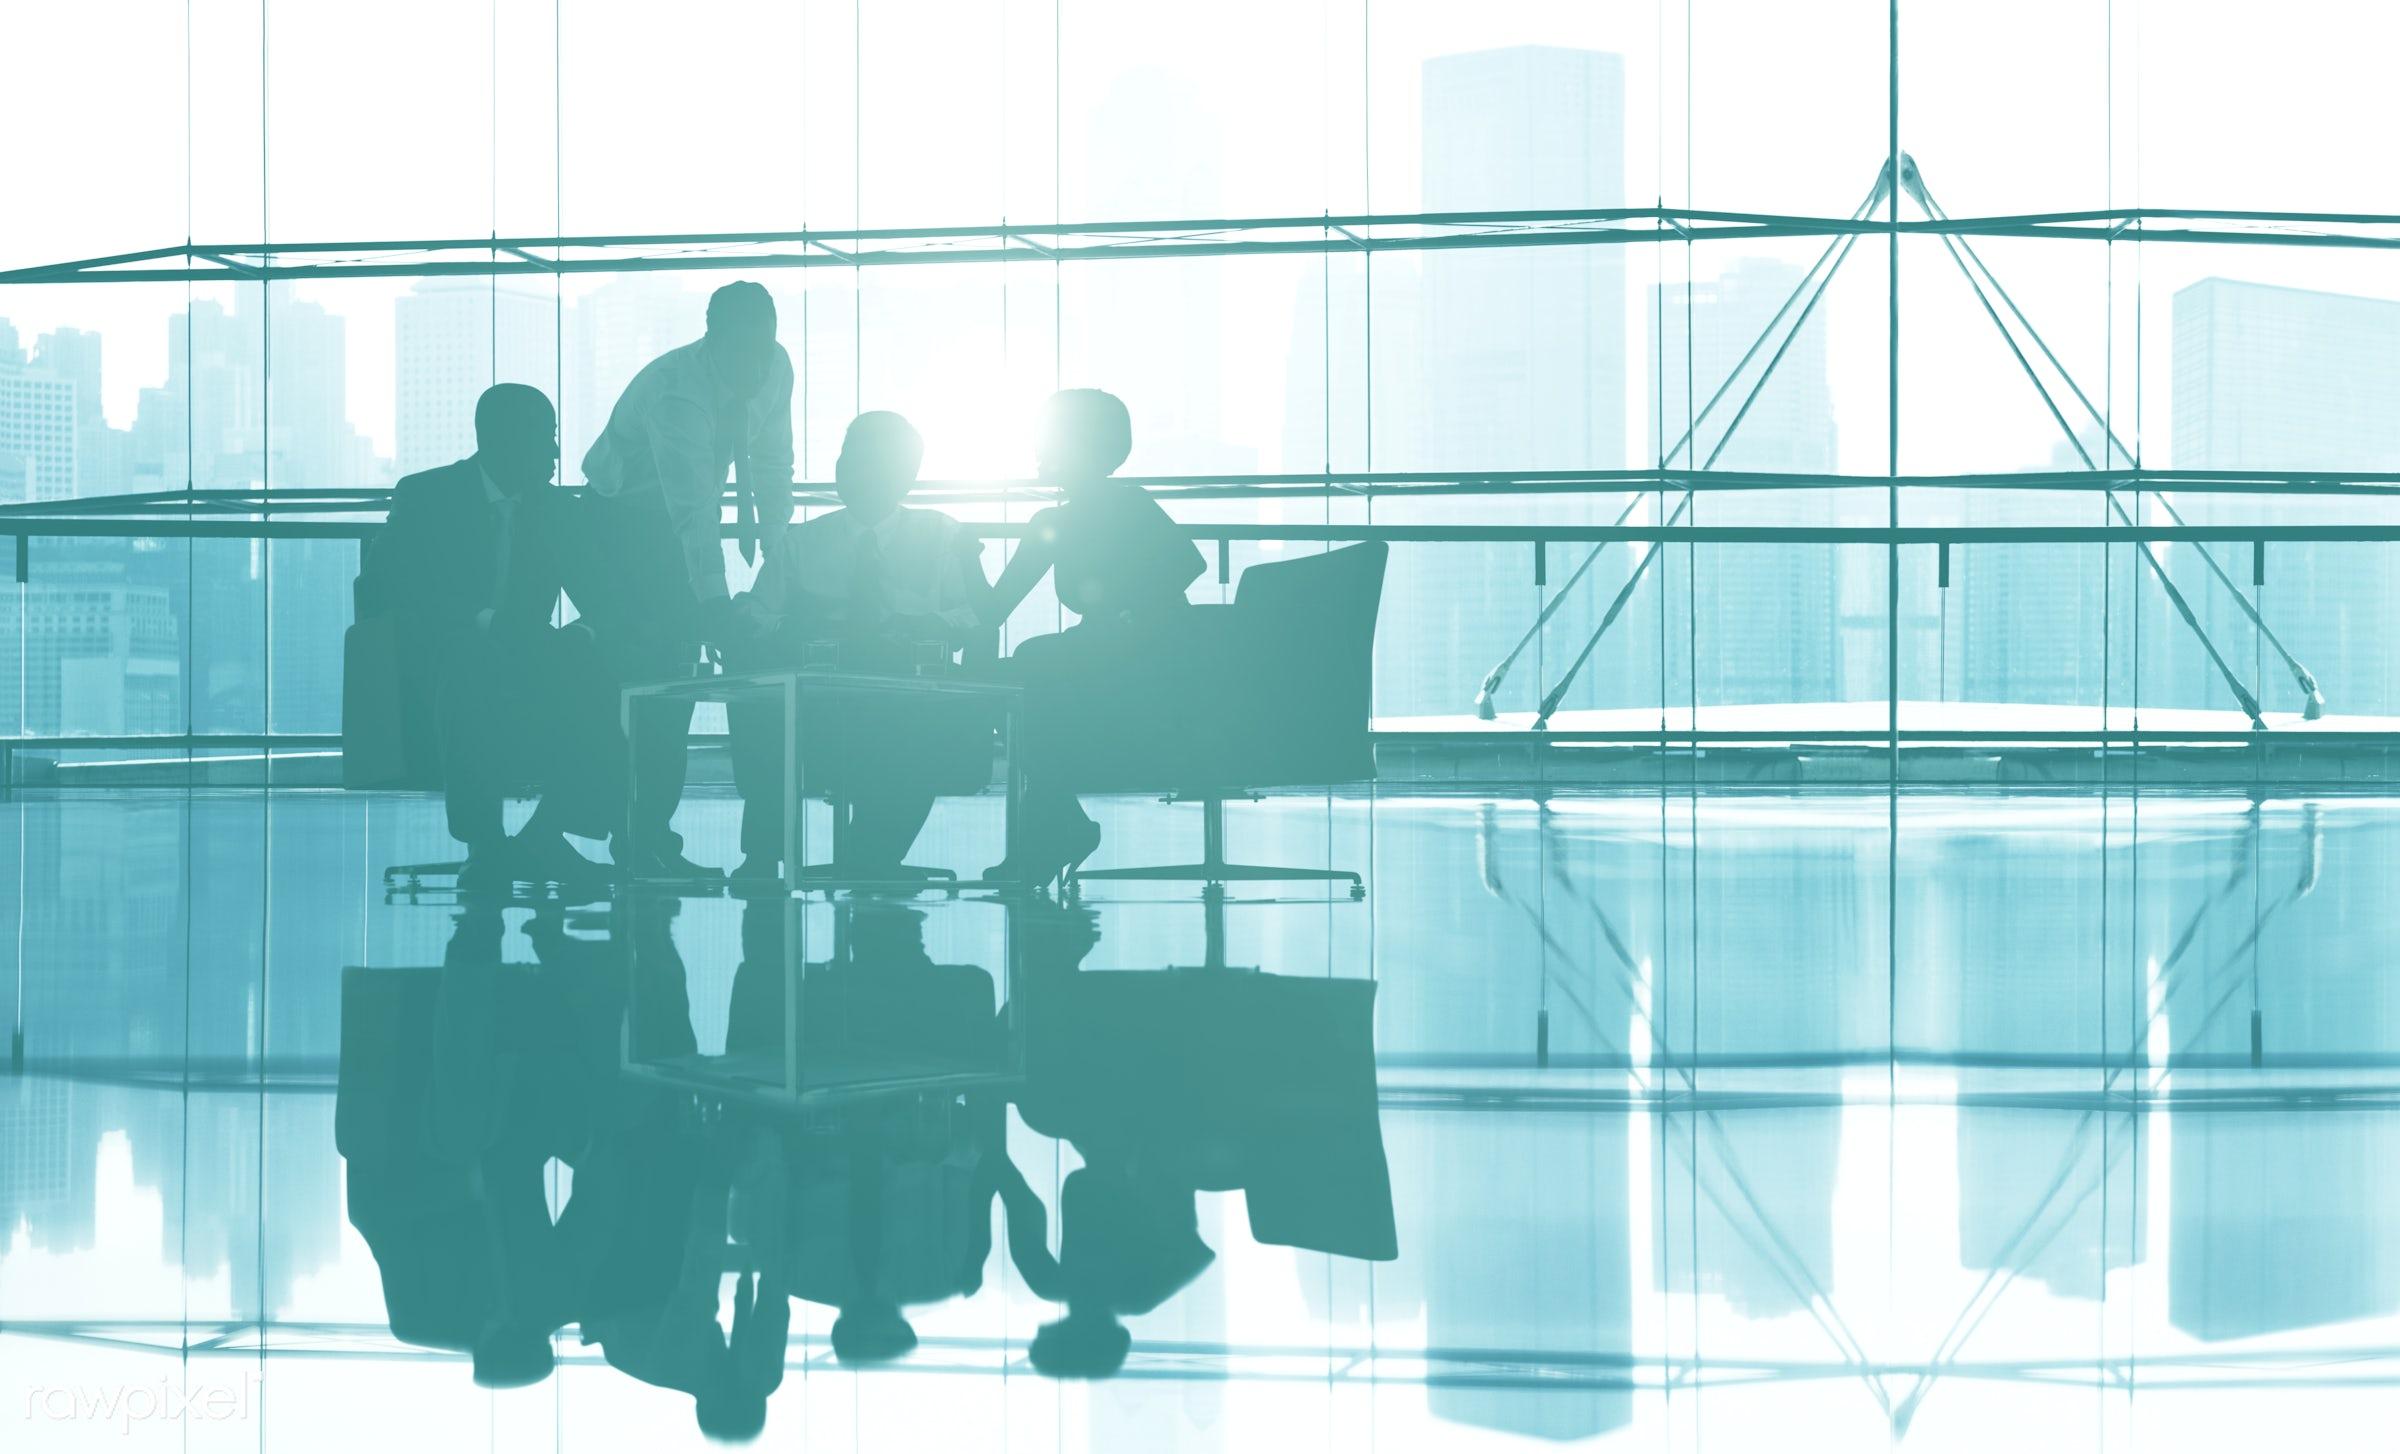 brainstorming, building, business, business people, businessmen, businesswomen, city, cityscape, colleague, communication,...